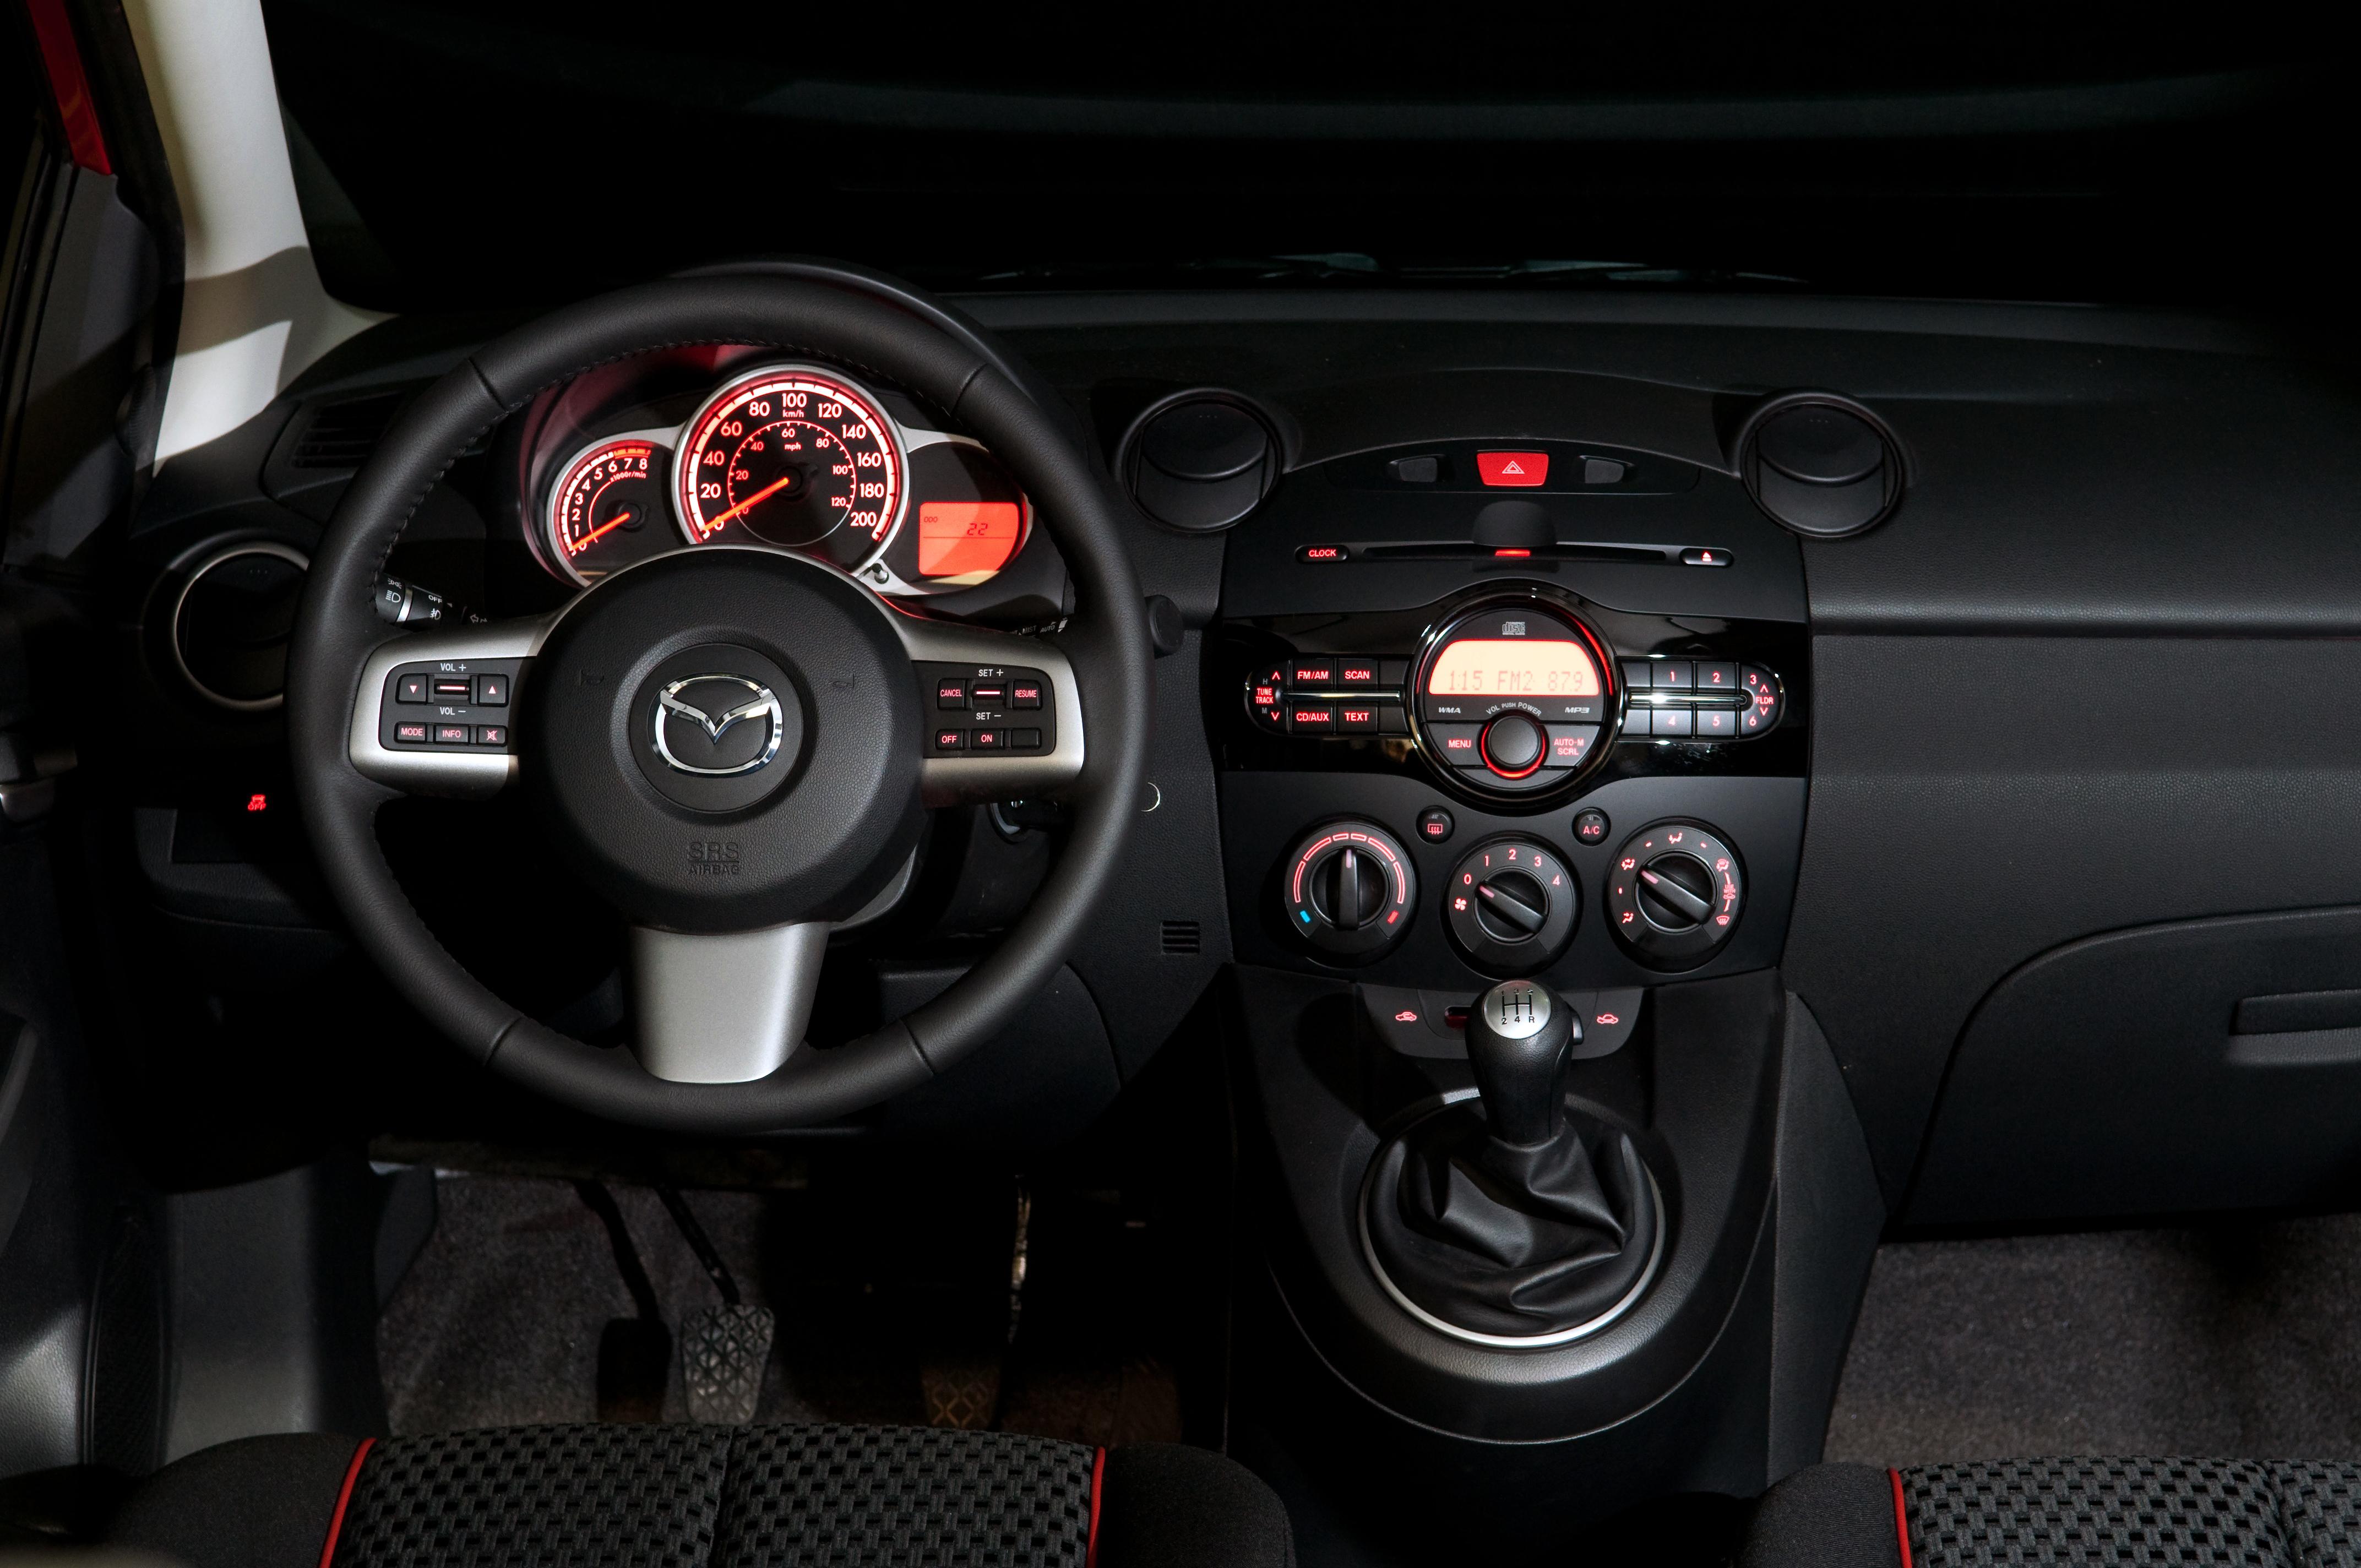 Mazda S Slick Little City Car The Auto News